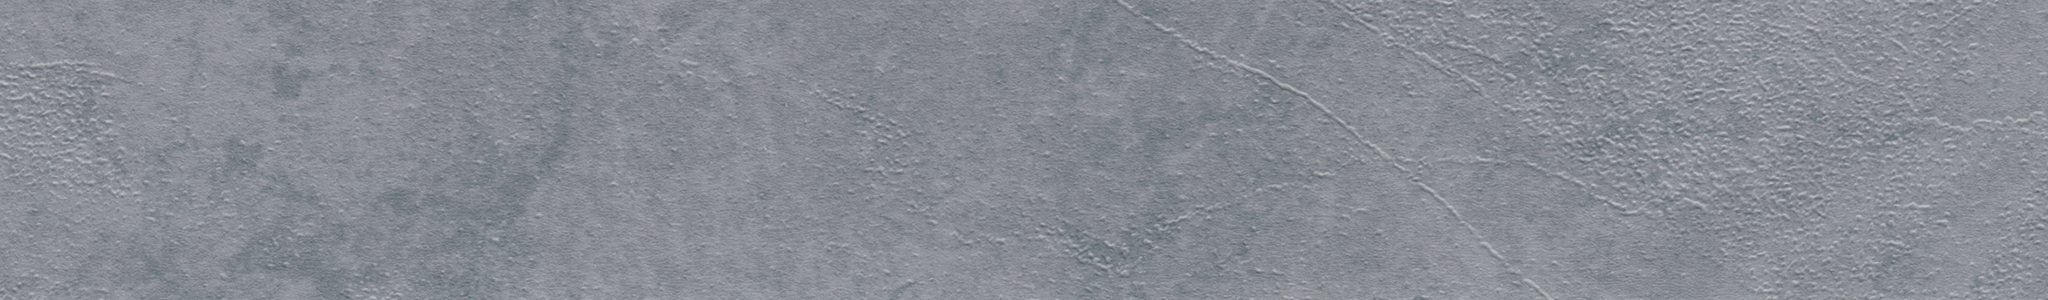 HD 297601 ABS Edge Loftec Softmatt